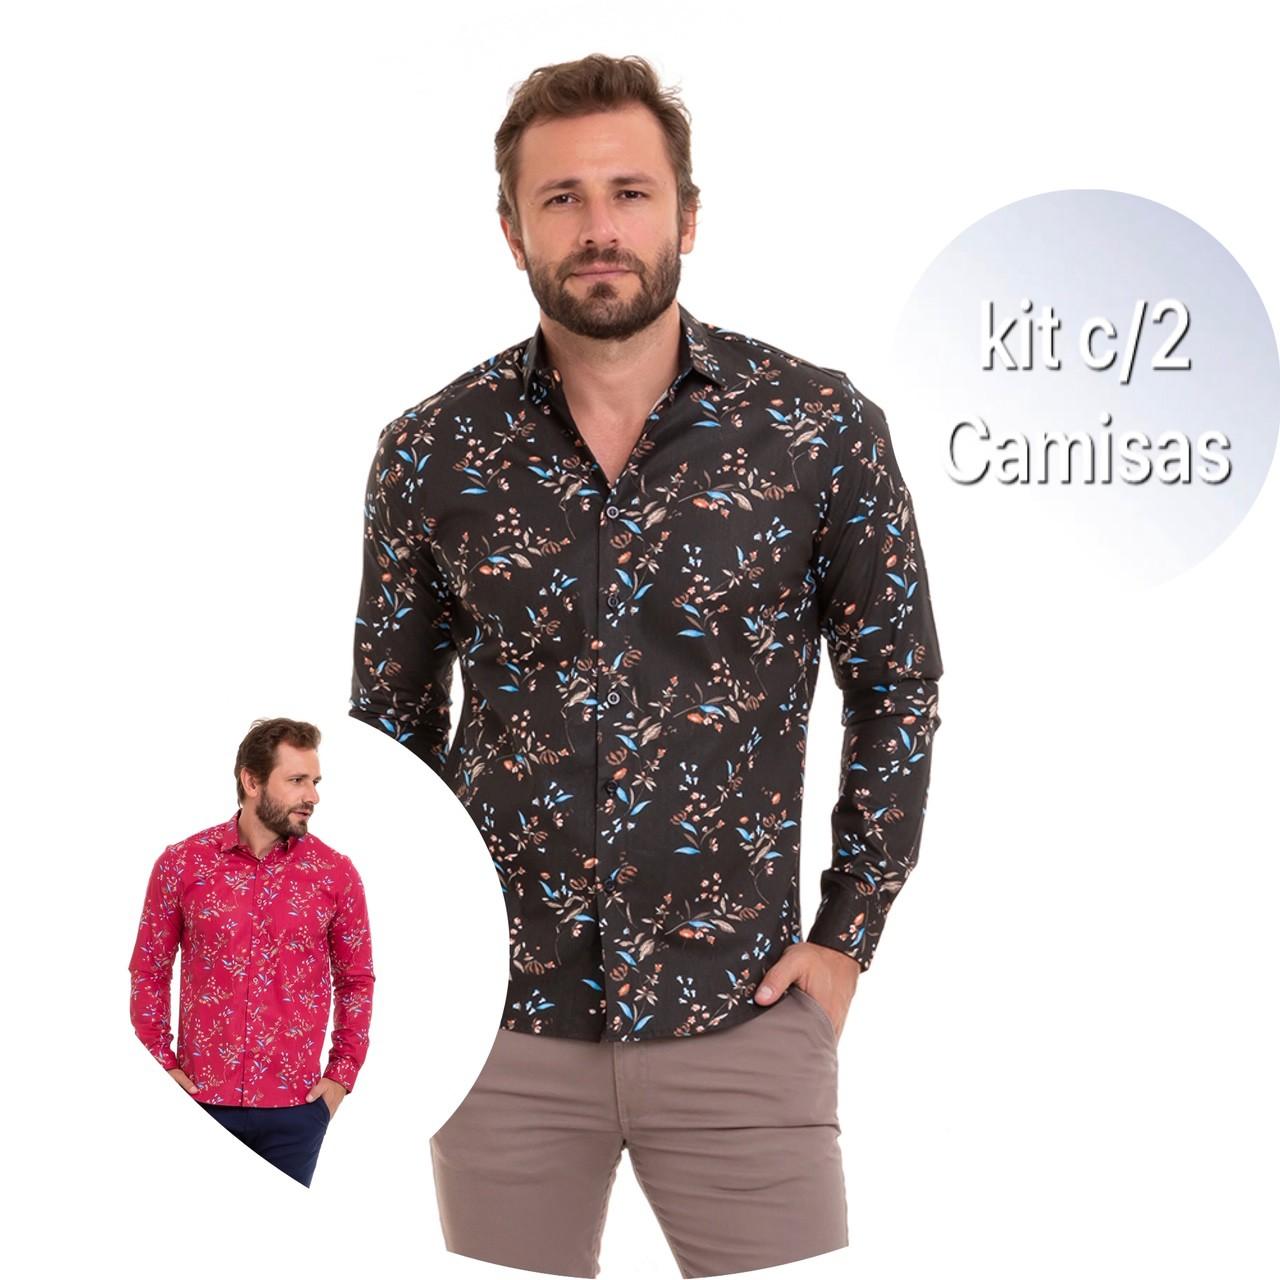 Kit C/2 Camisa Masculina Manga Longa Conexão